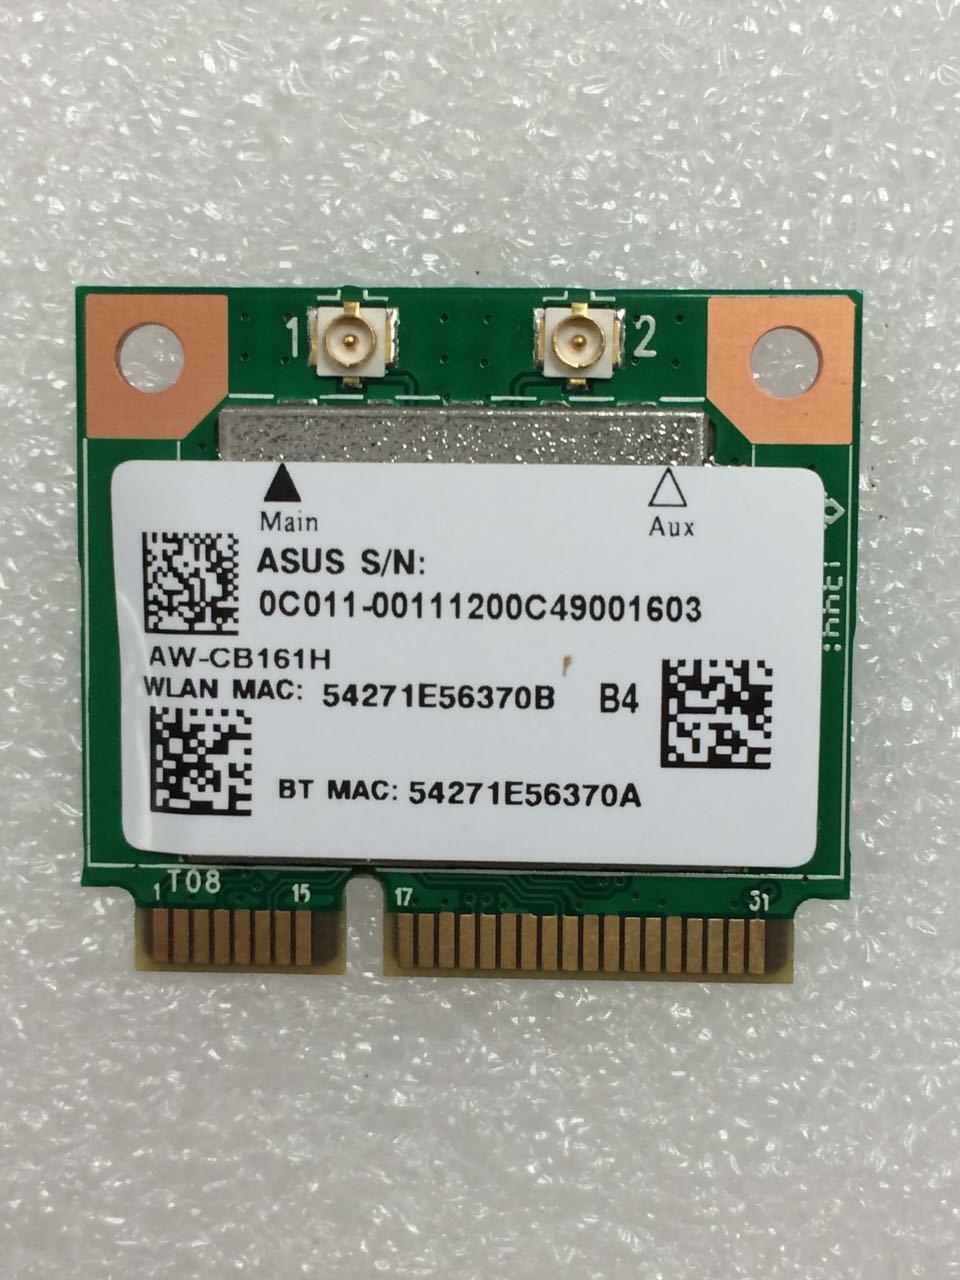 AzureWave RTL8821AE AW-CB161H  AW-CB161N 433Mbps AC  Half Mini PCIe WLAN WIFI  BlueTooth4.0 Card